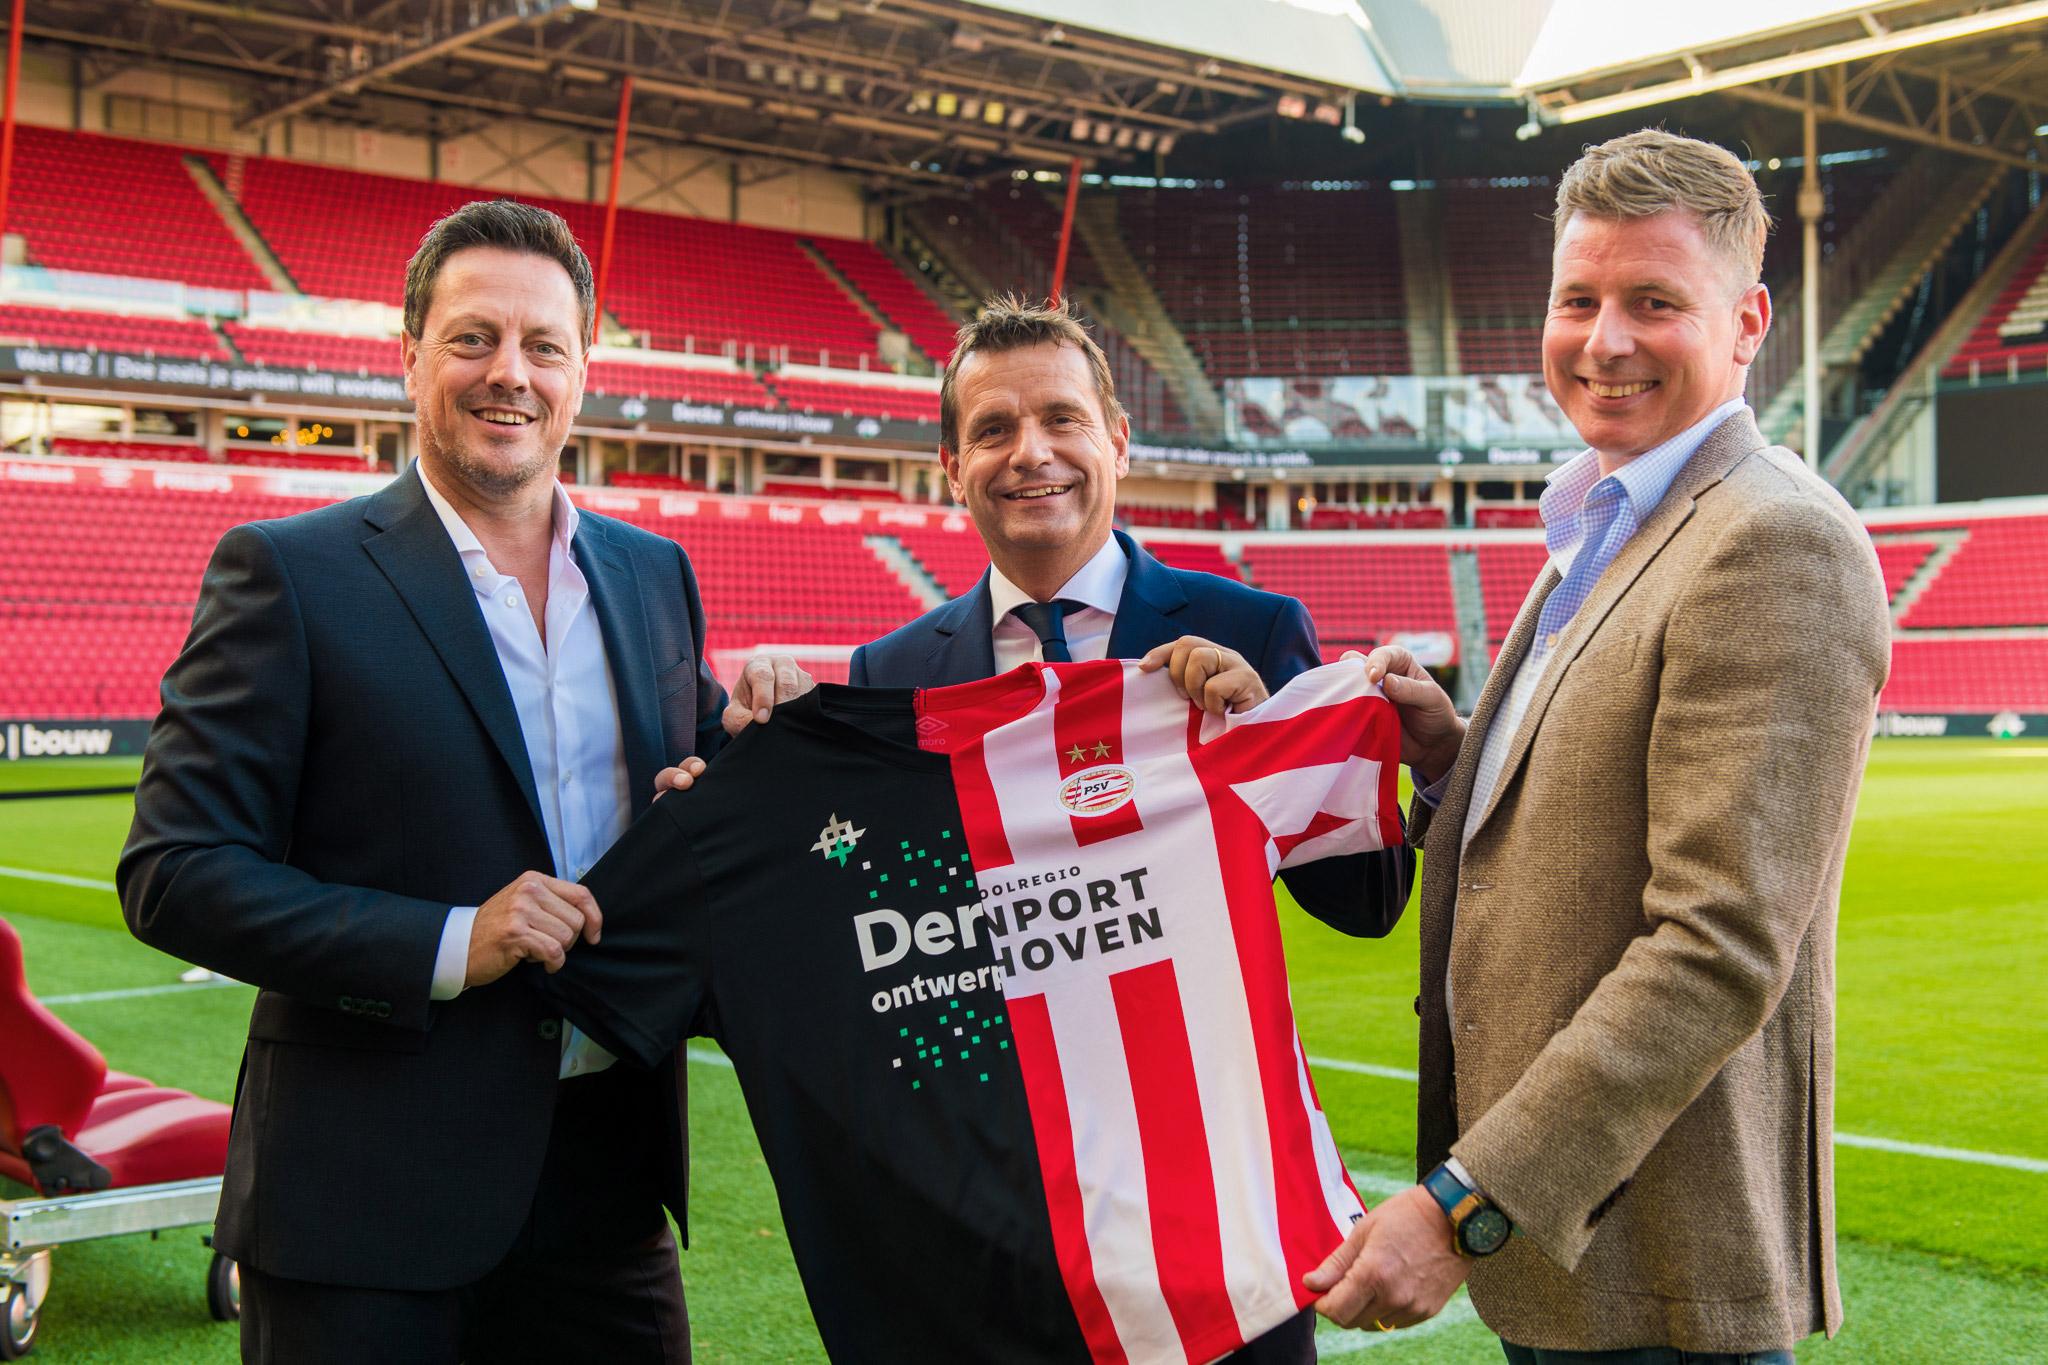 Official Sponsor of PSV